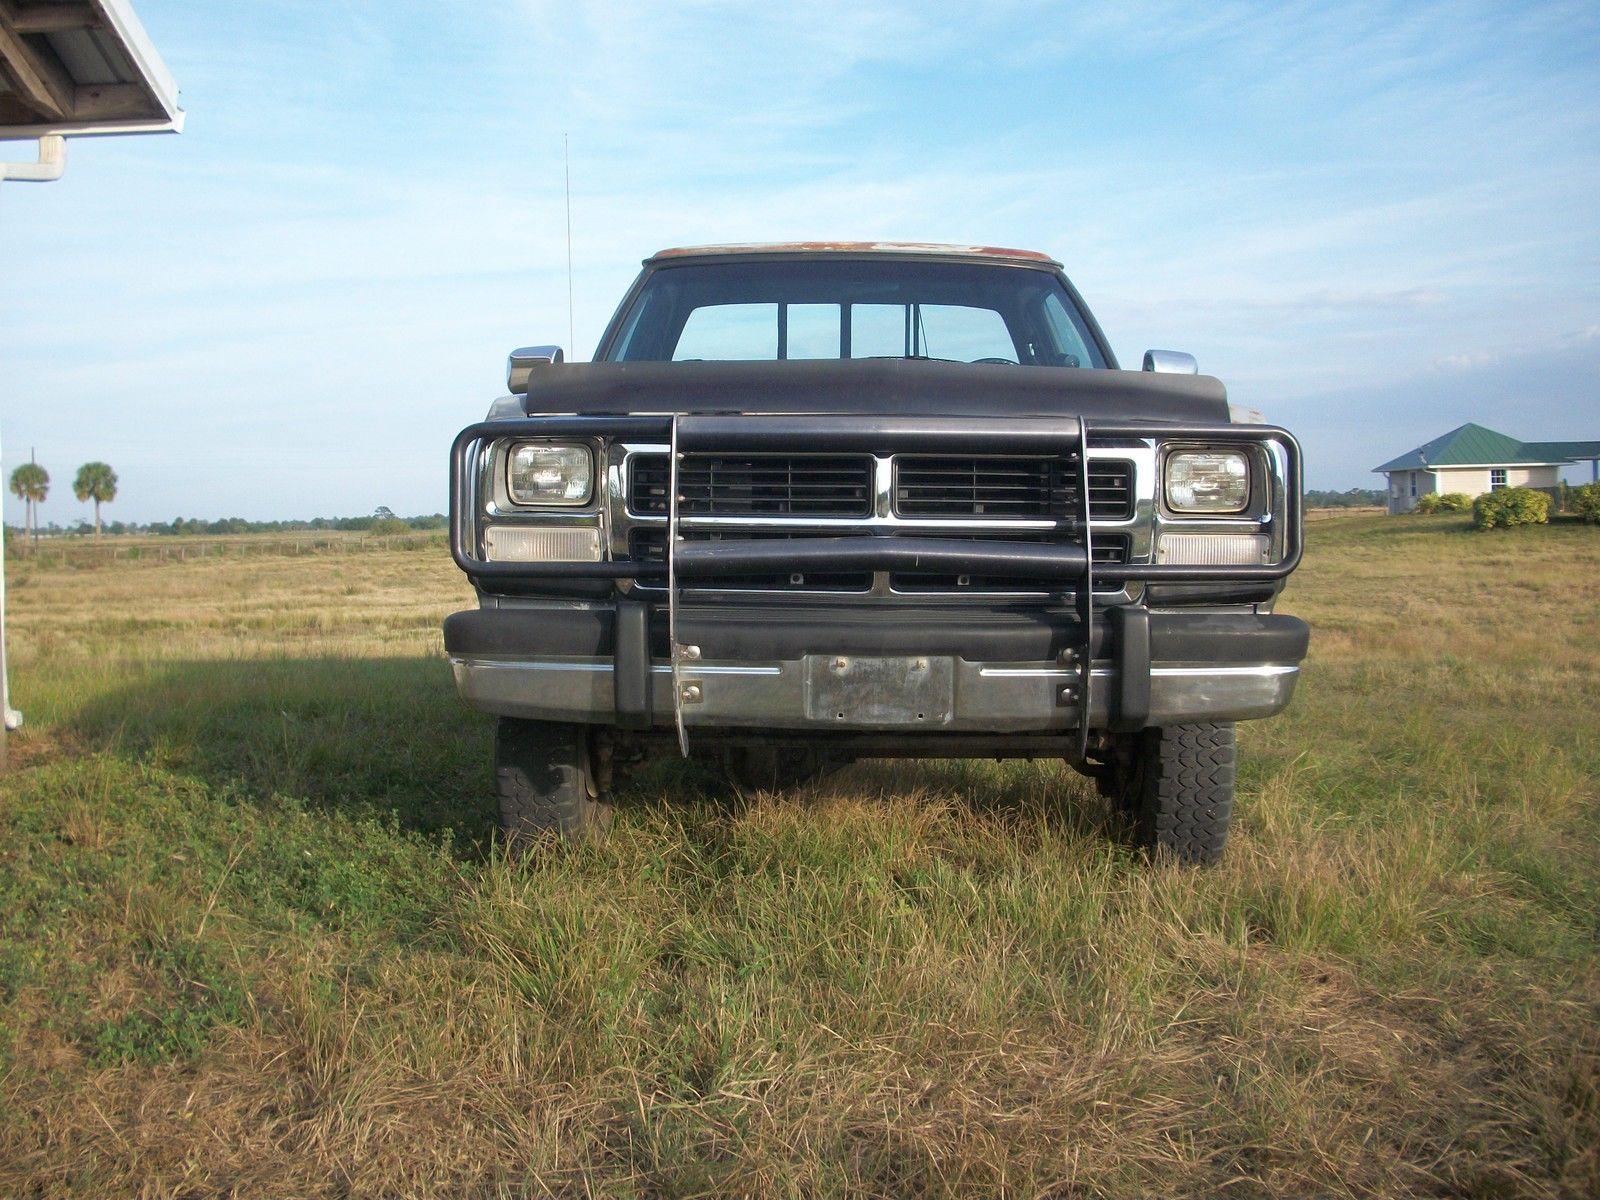 original 1992 dodge ram w250 4x4 5 speed le 5 9 ic cummins turbo diesel for sale in indiantown. Black Bedroom Furniture Sets. Home Design Ideas